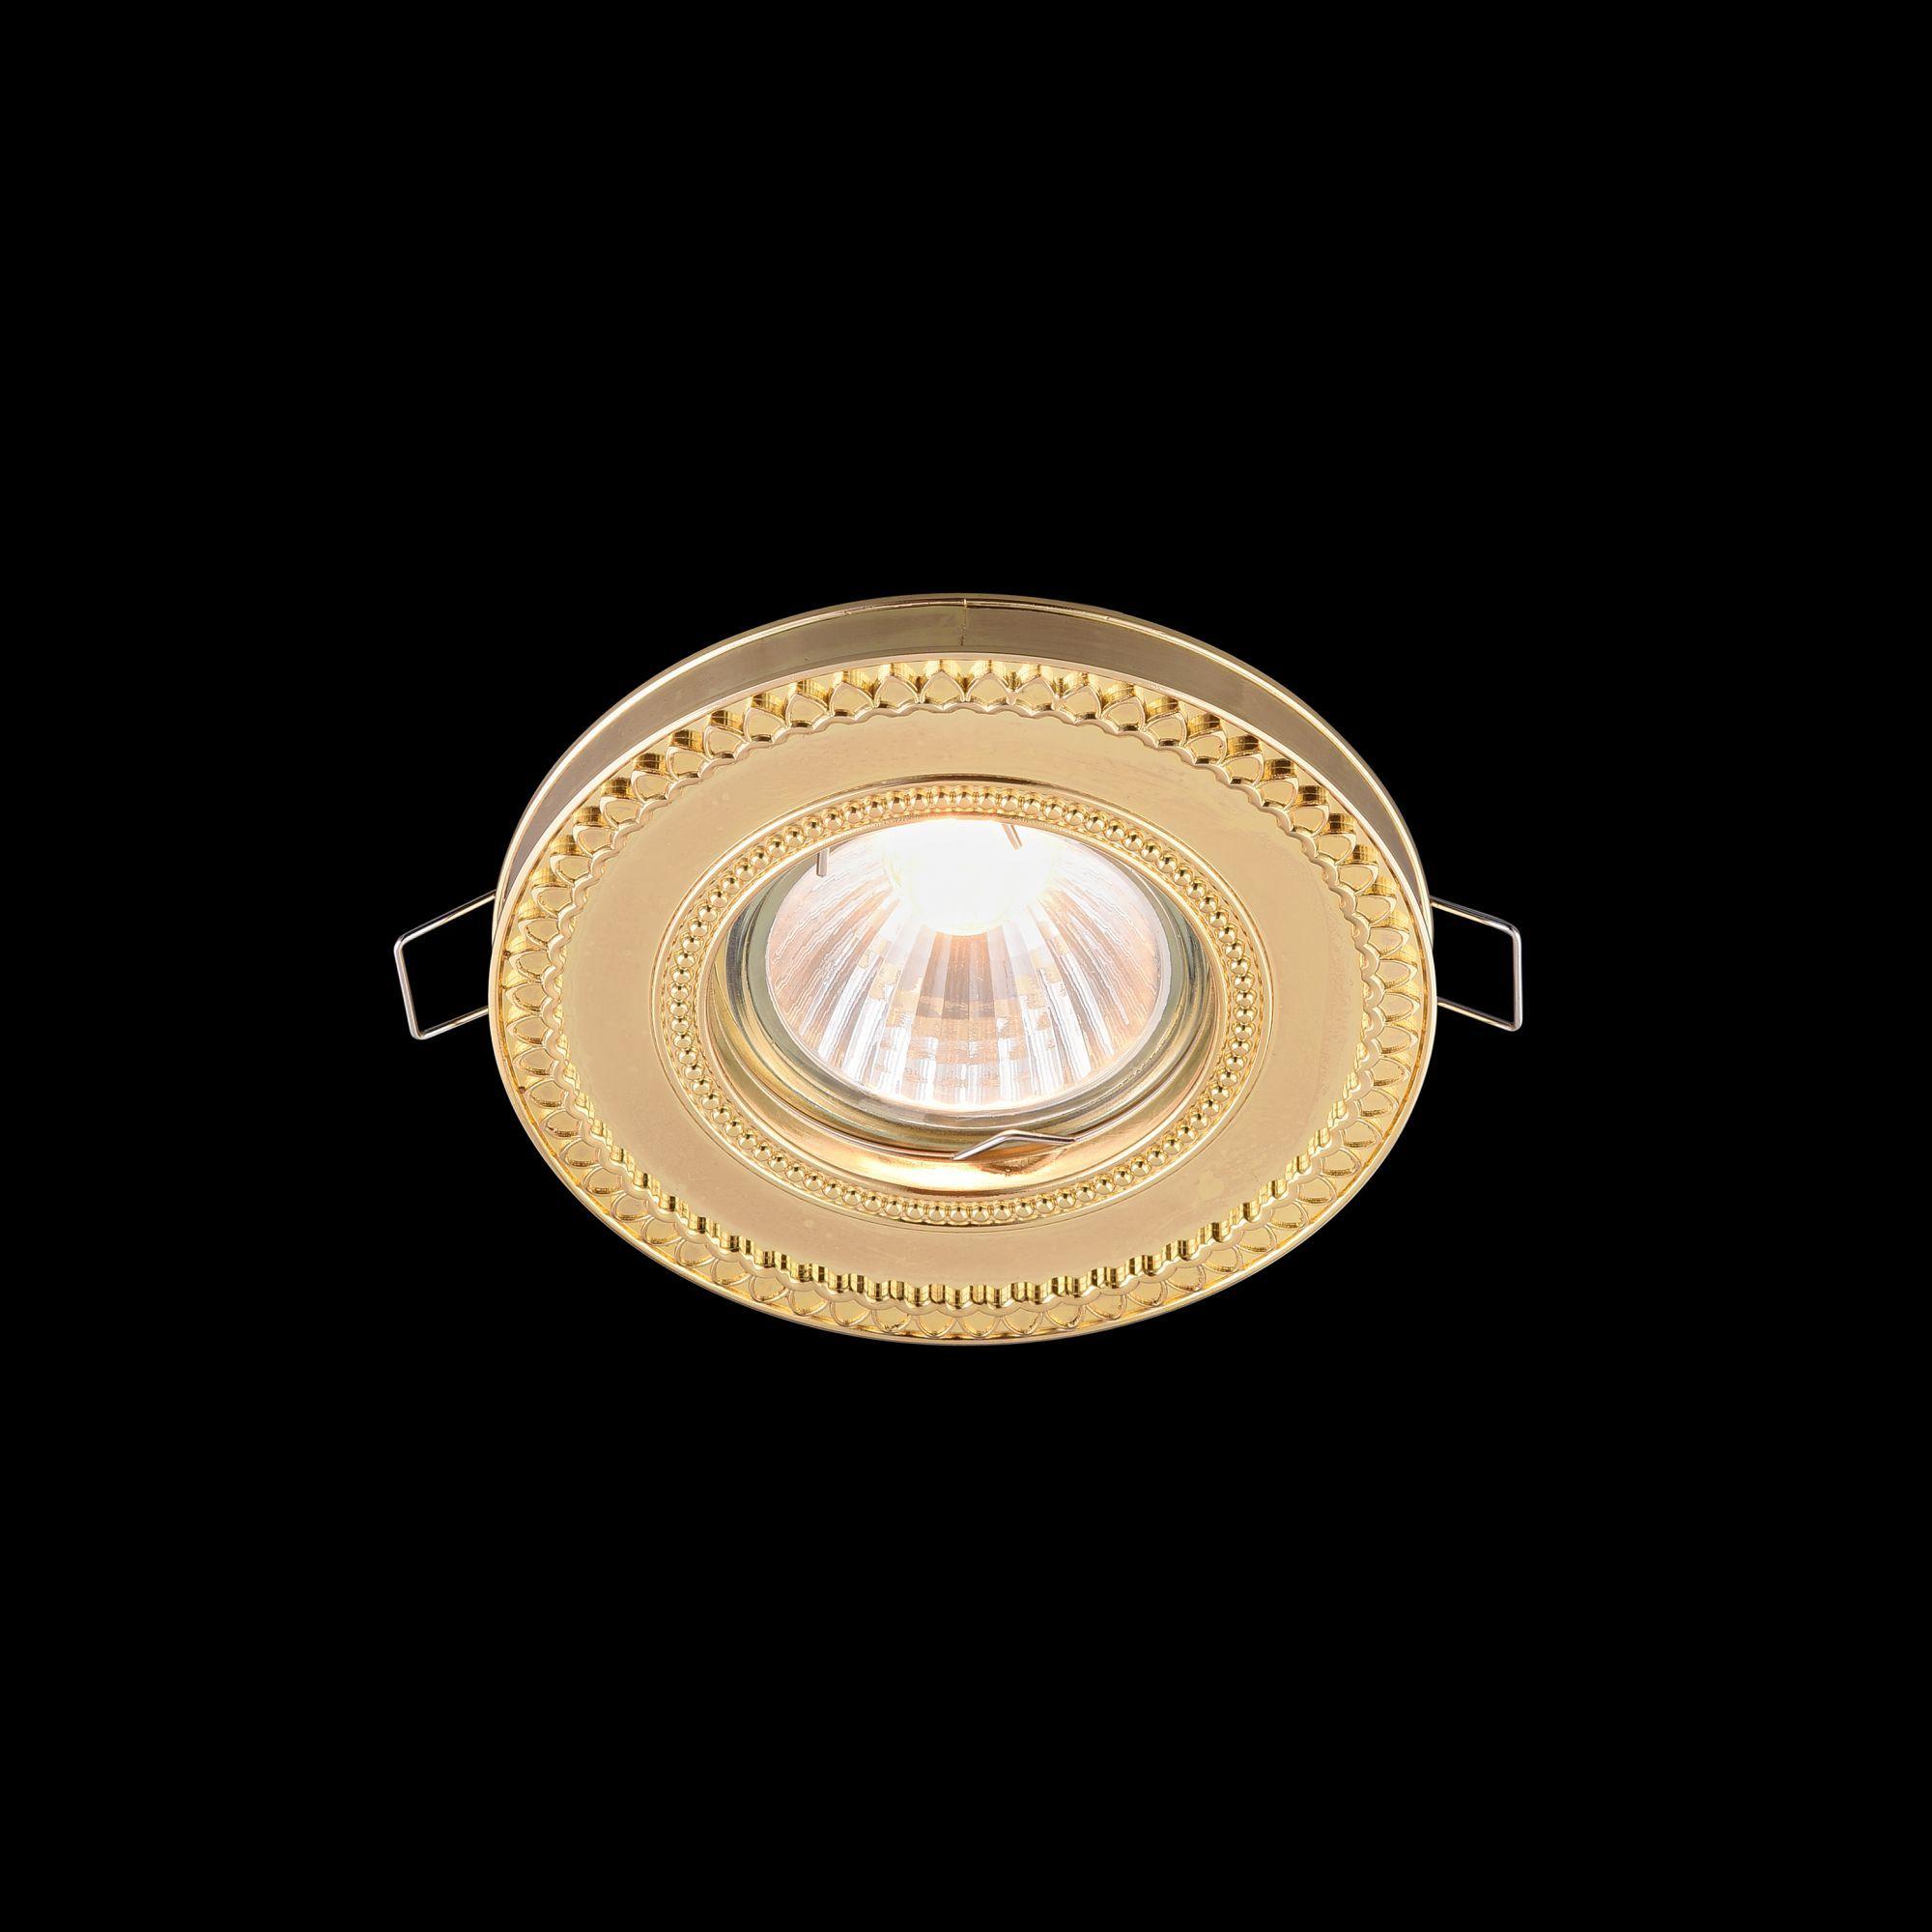 Встраиваемый светильник Maytoni Metal Classic DL302-2-01-G, 1xGU10x50W, золото, металл - фото 4